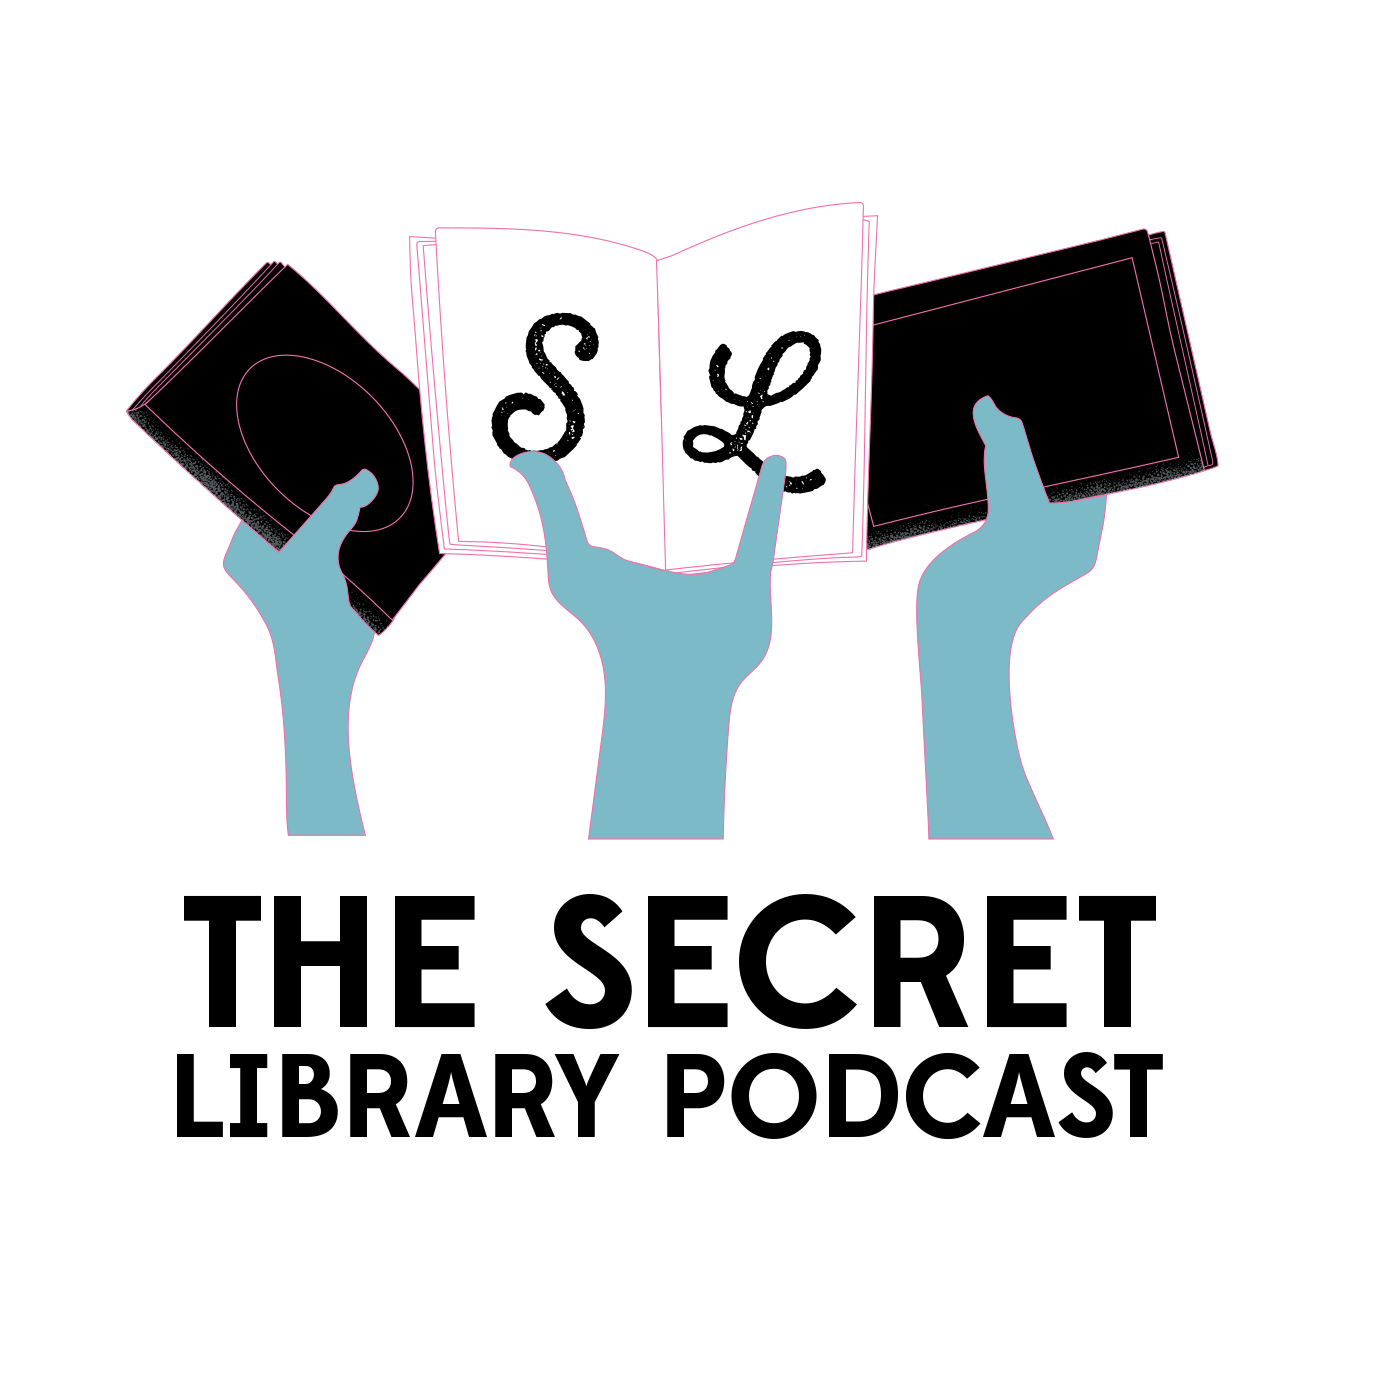 The Secret Library Podcast show art